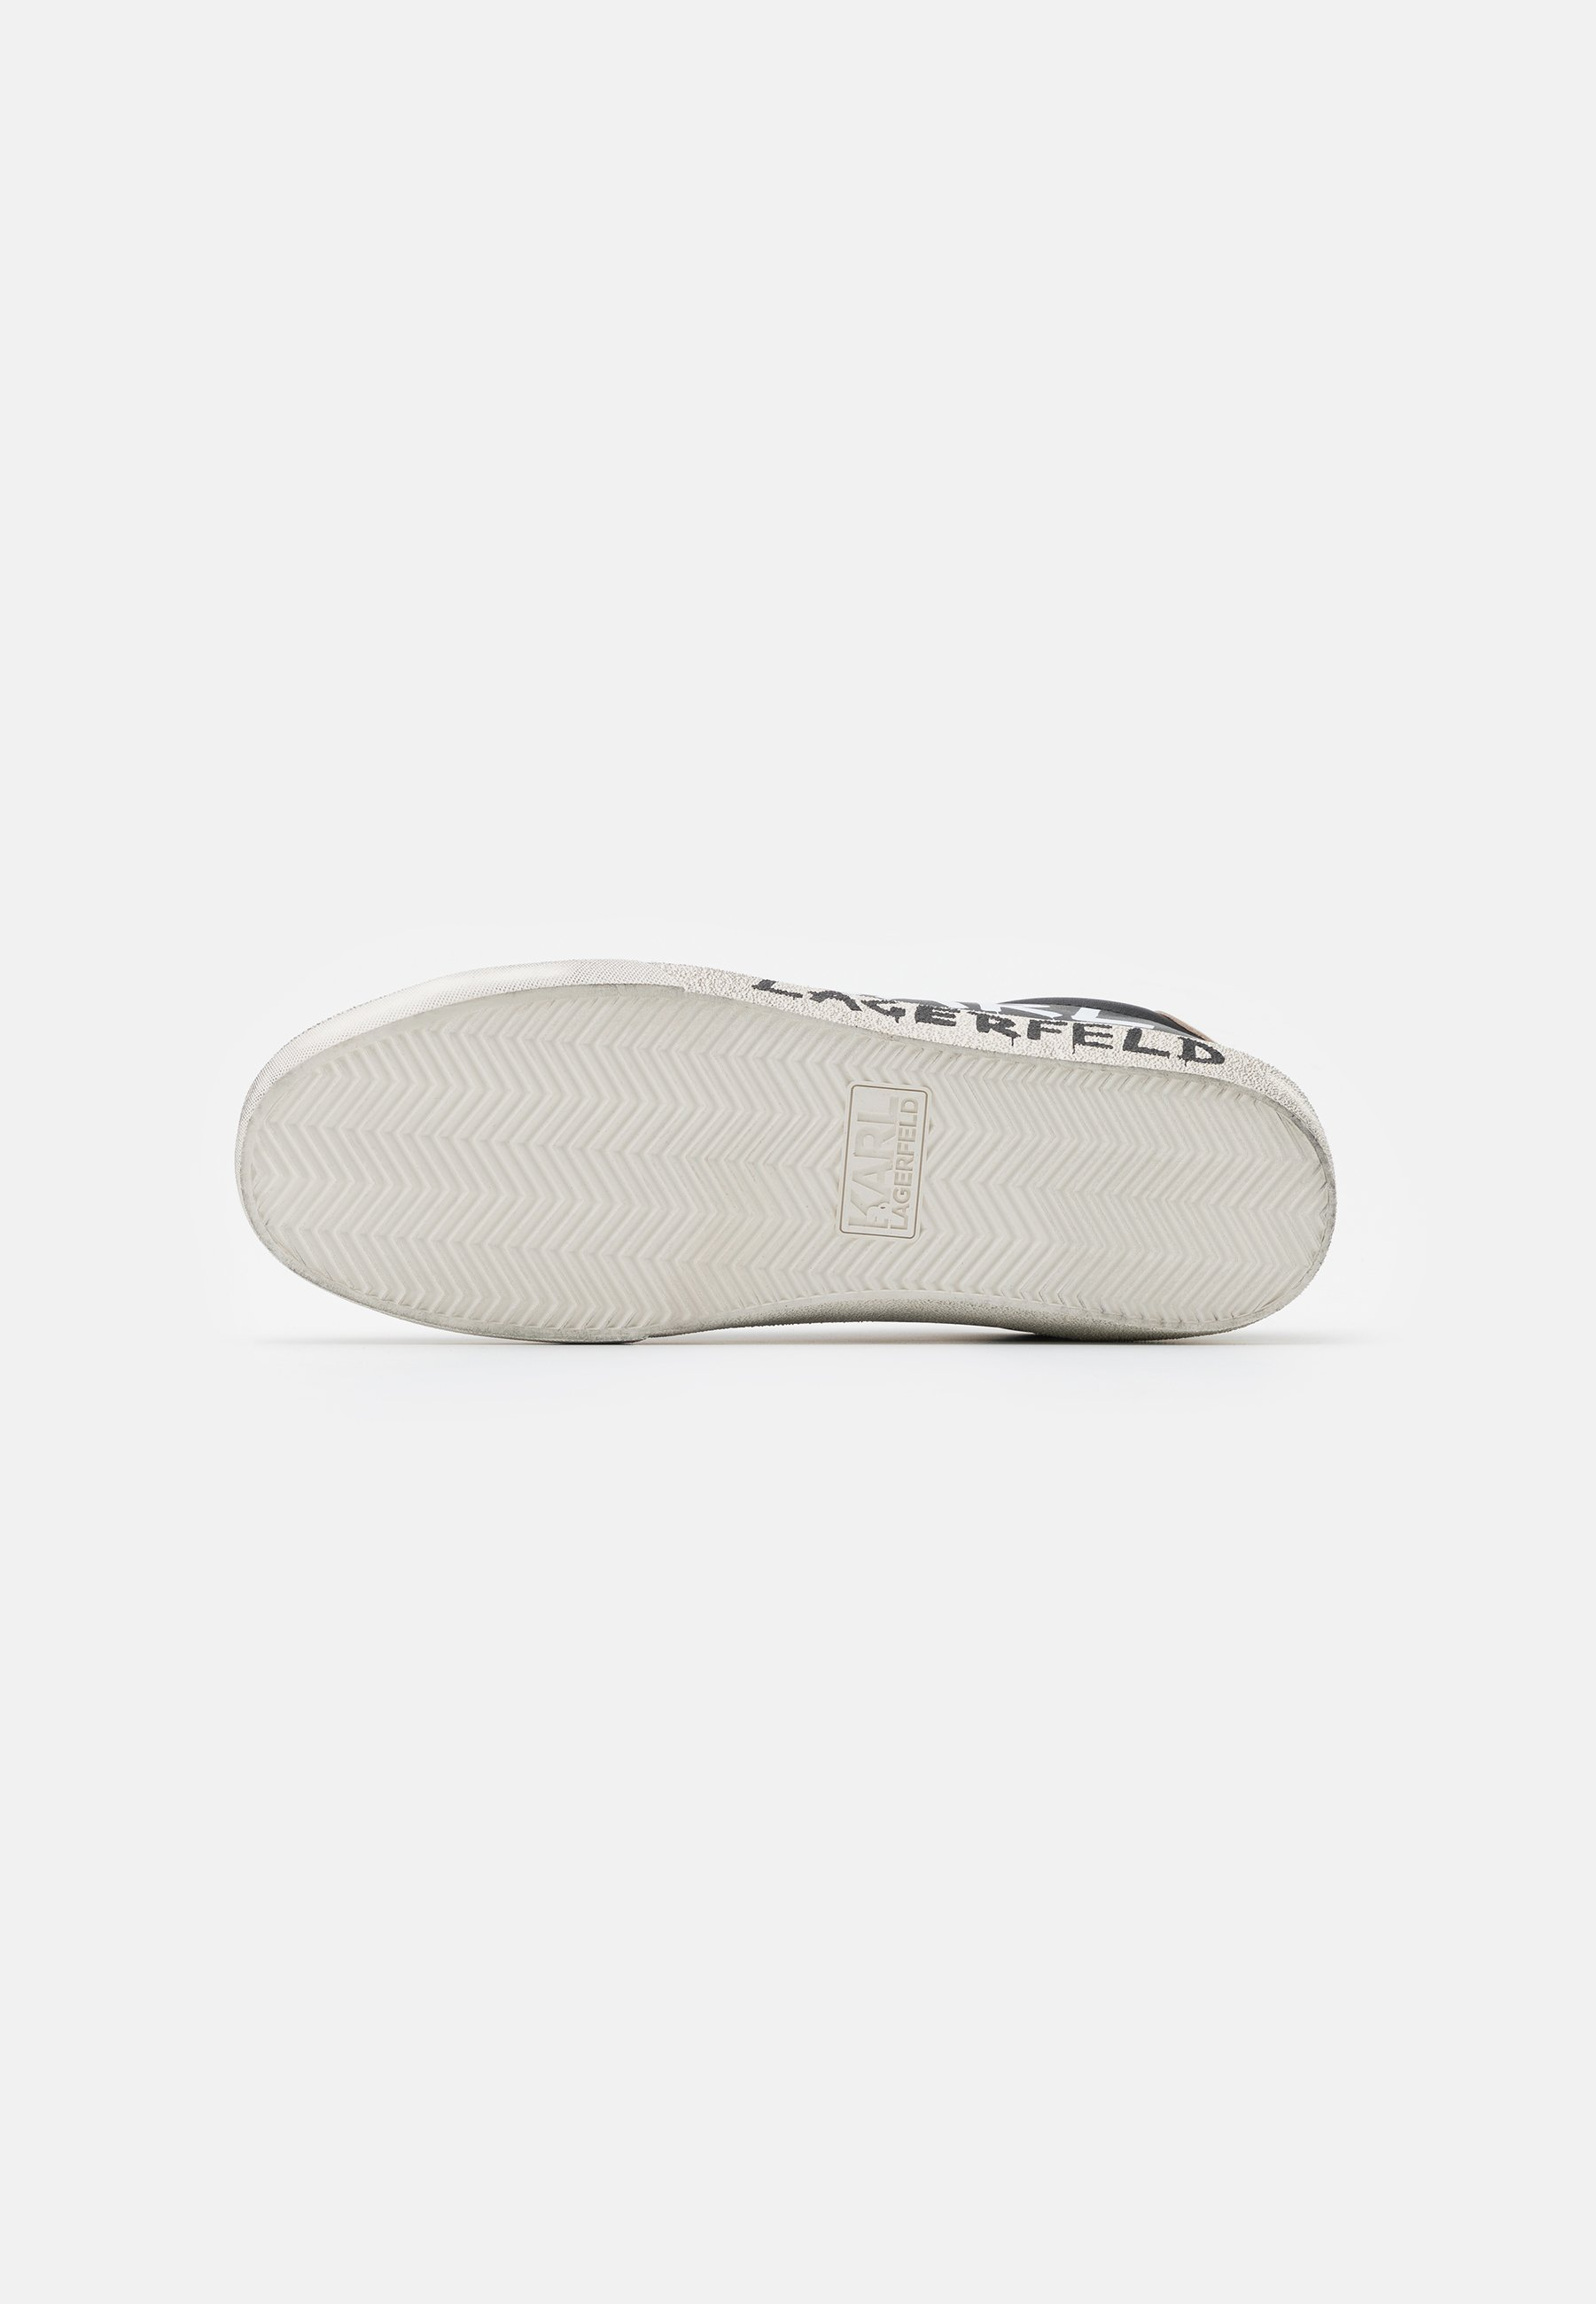 KARL LAGERFELD SKOOL BRUSH LOGO LACE - Sneaker low - black/schwarz - Herrenschuhe 2QcCI